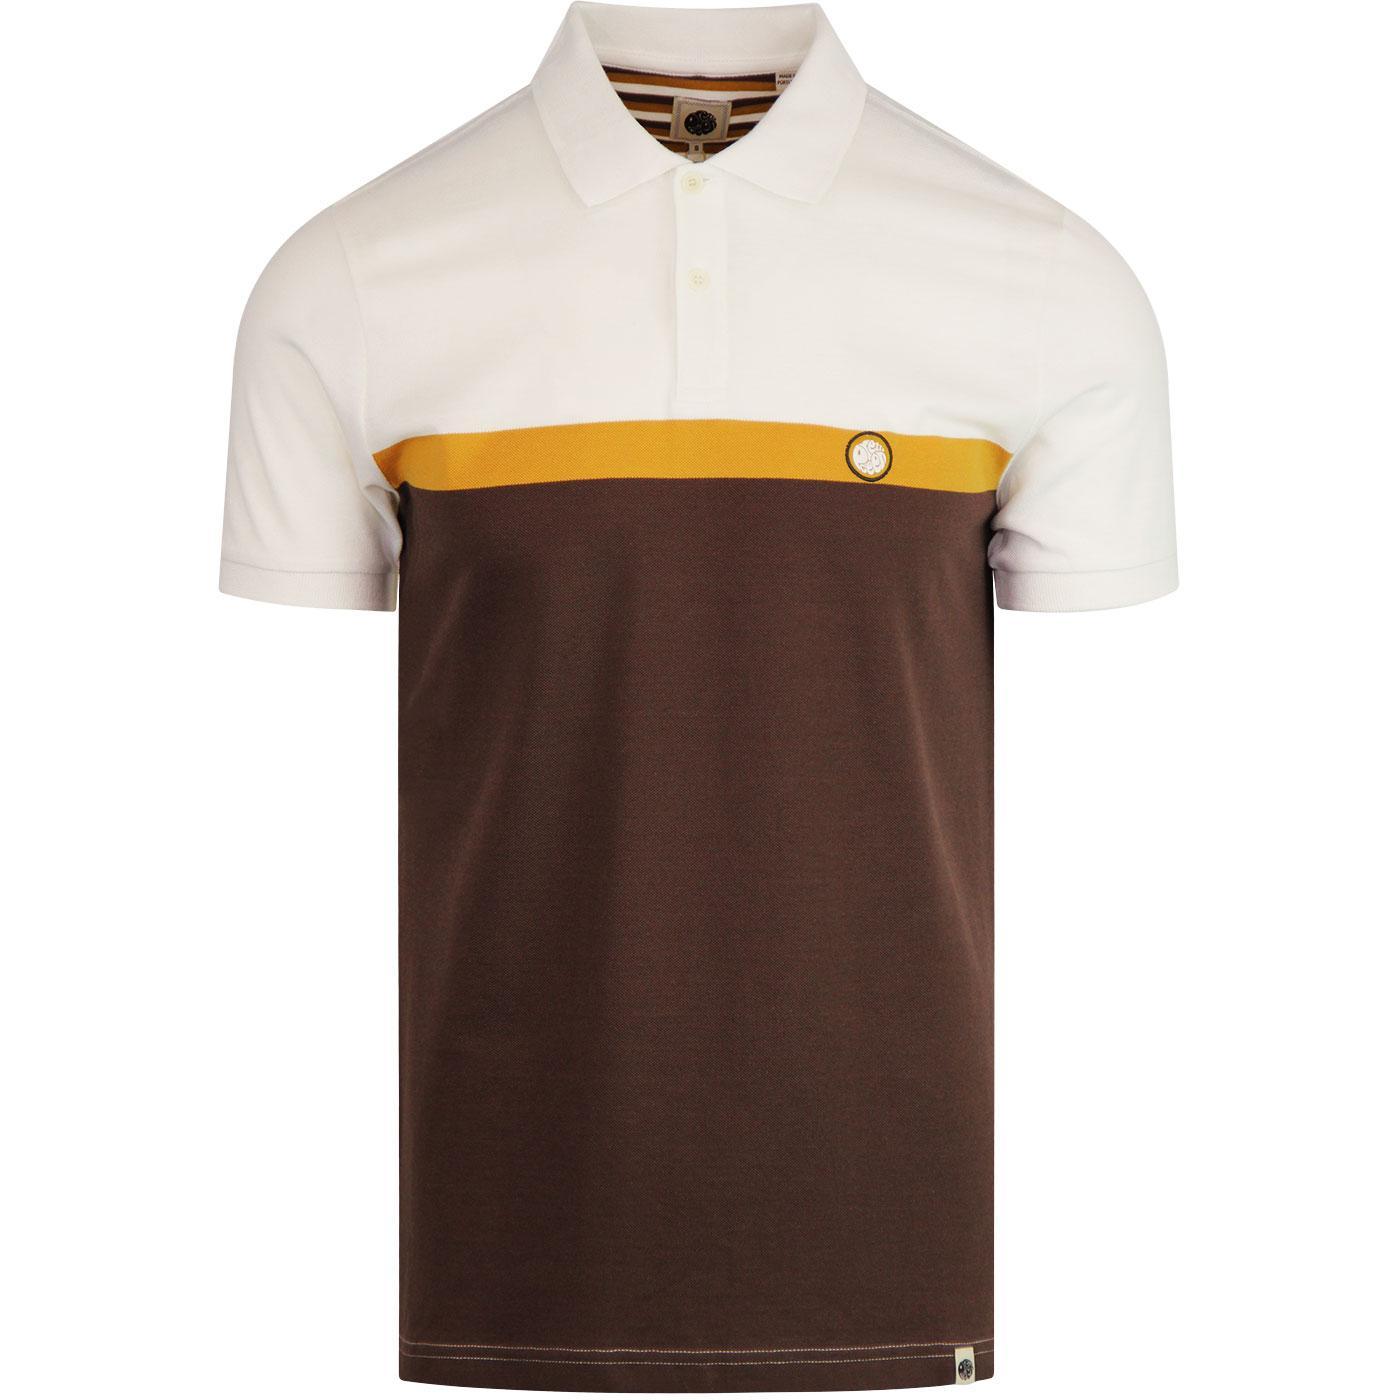 PRETTY GREEN 60s Mod Colour Block Polo Shirt BROWN